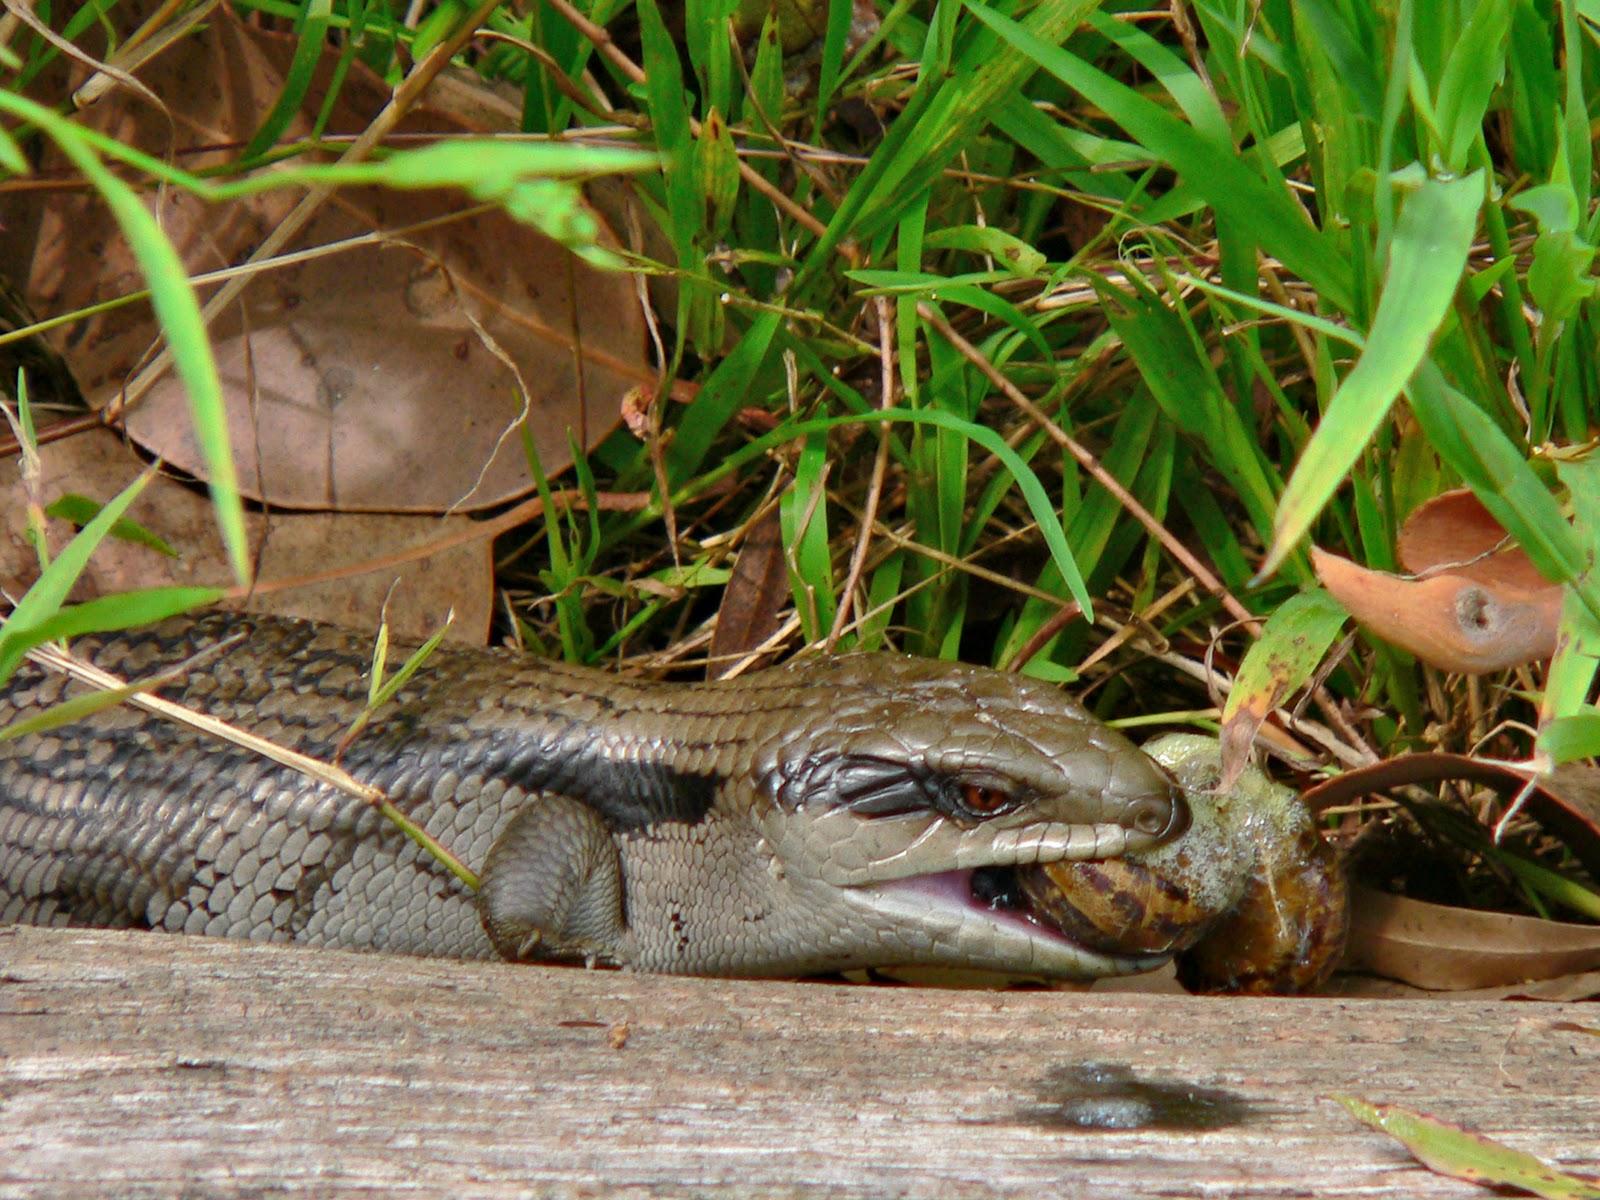 Animal Kingdom Reptiles